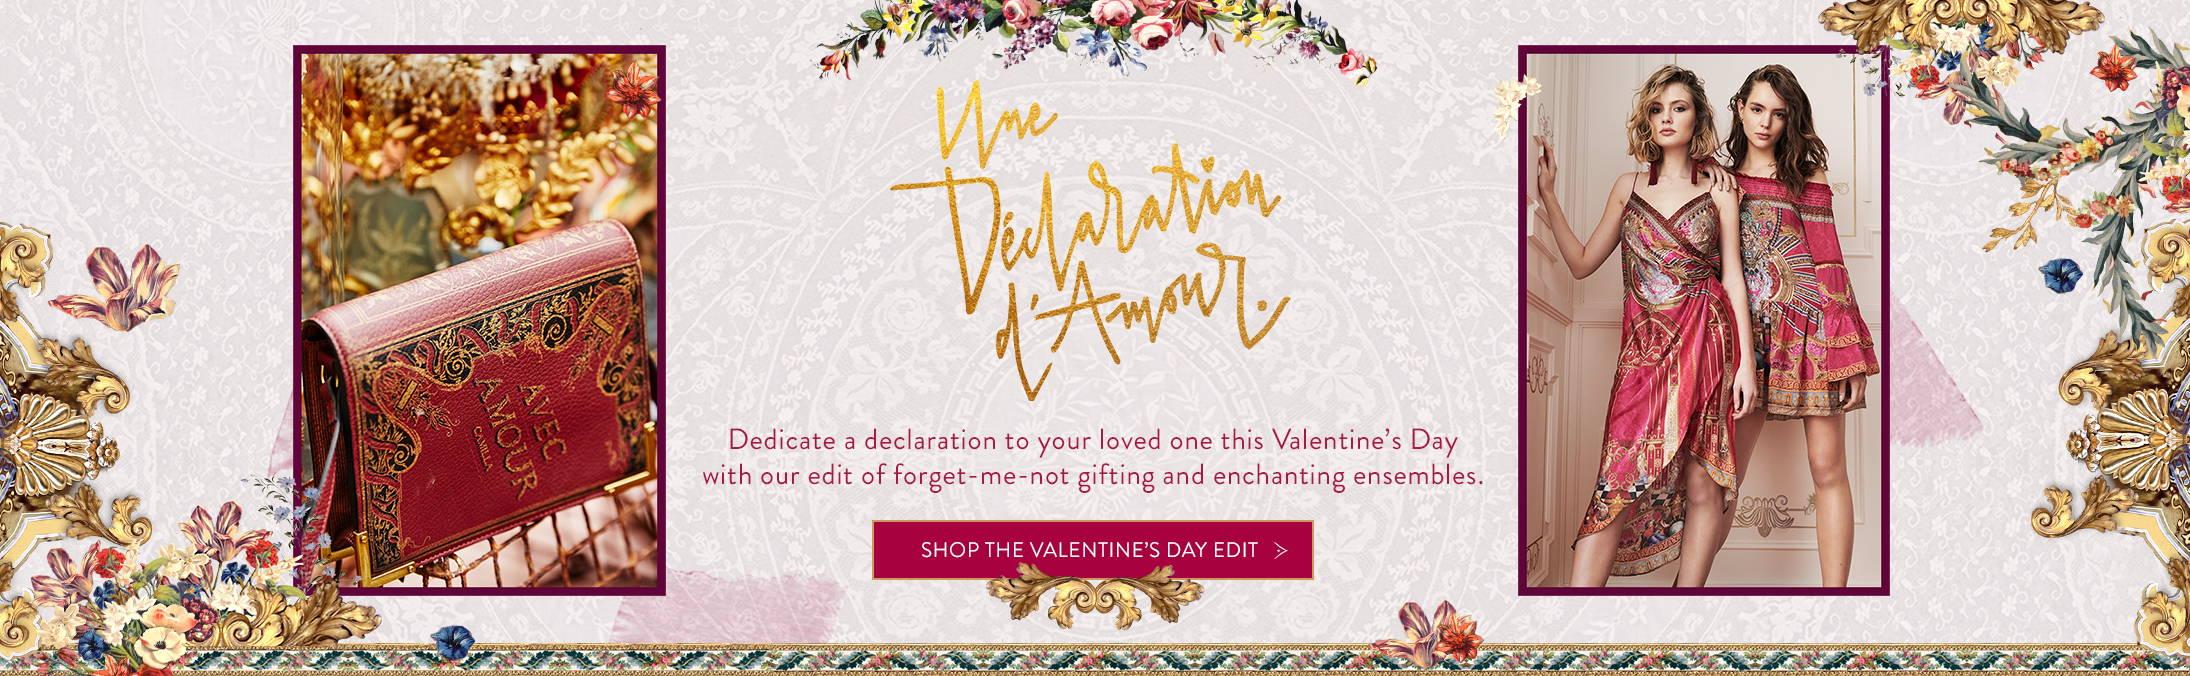 Shop The Valentine's Day Edit